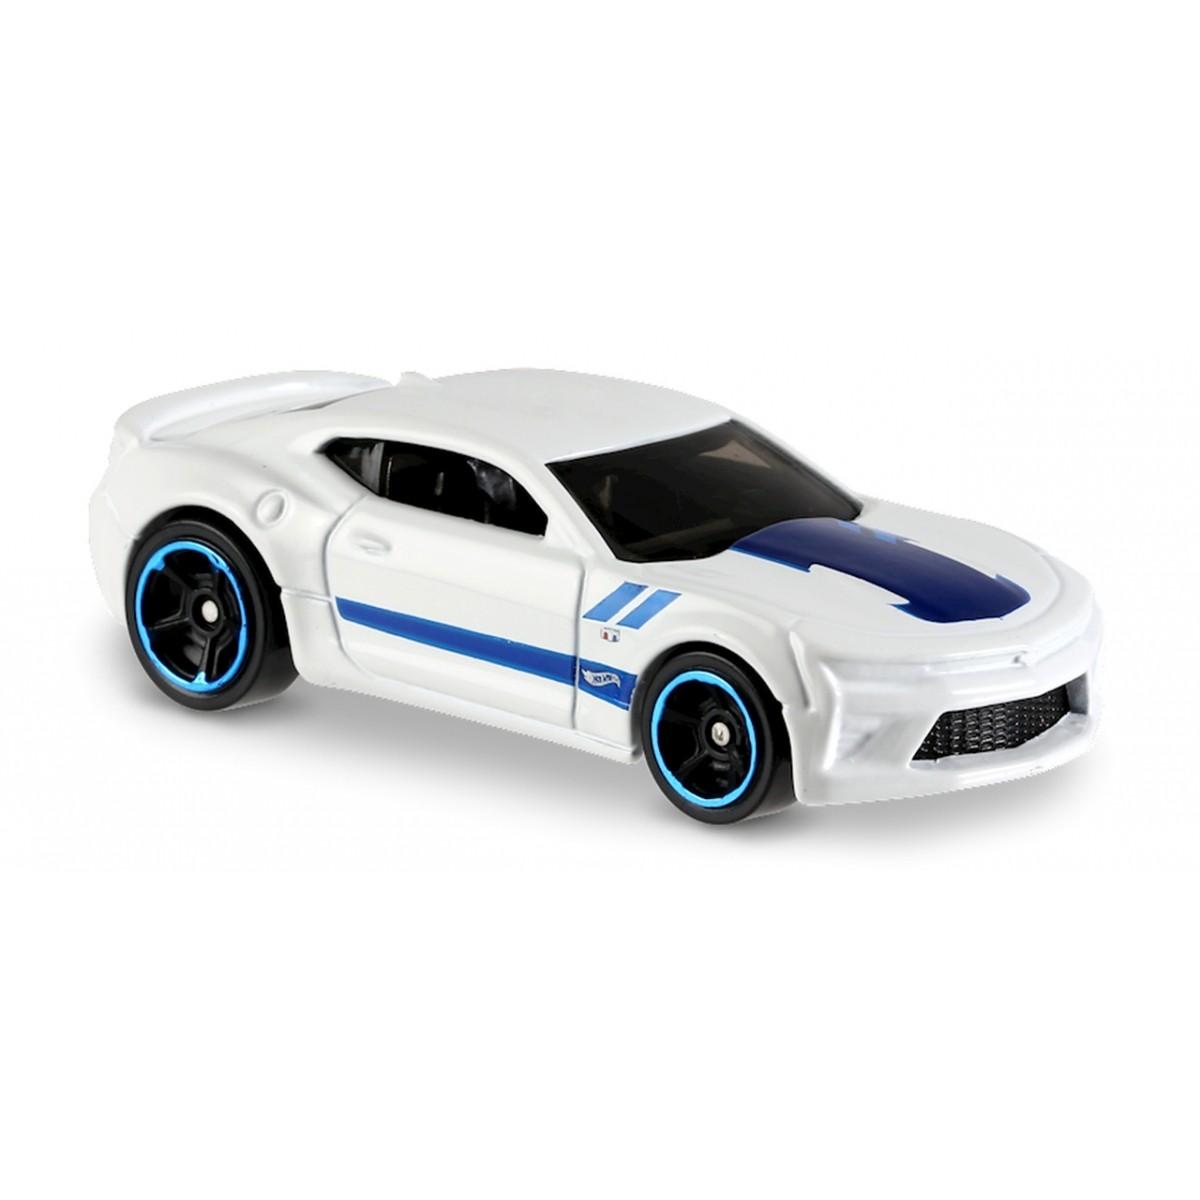 Carrinho Hot Wheels: '16 Camaro SS Branco